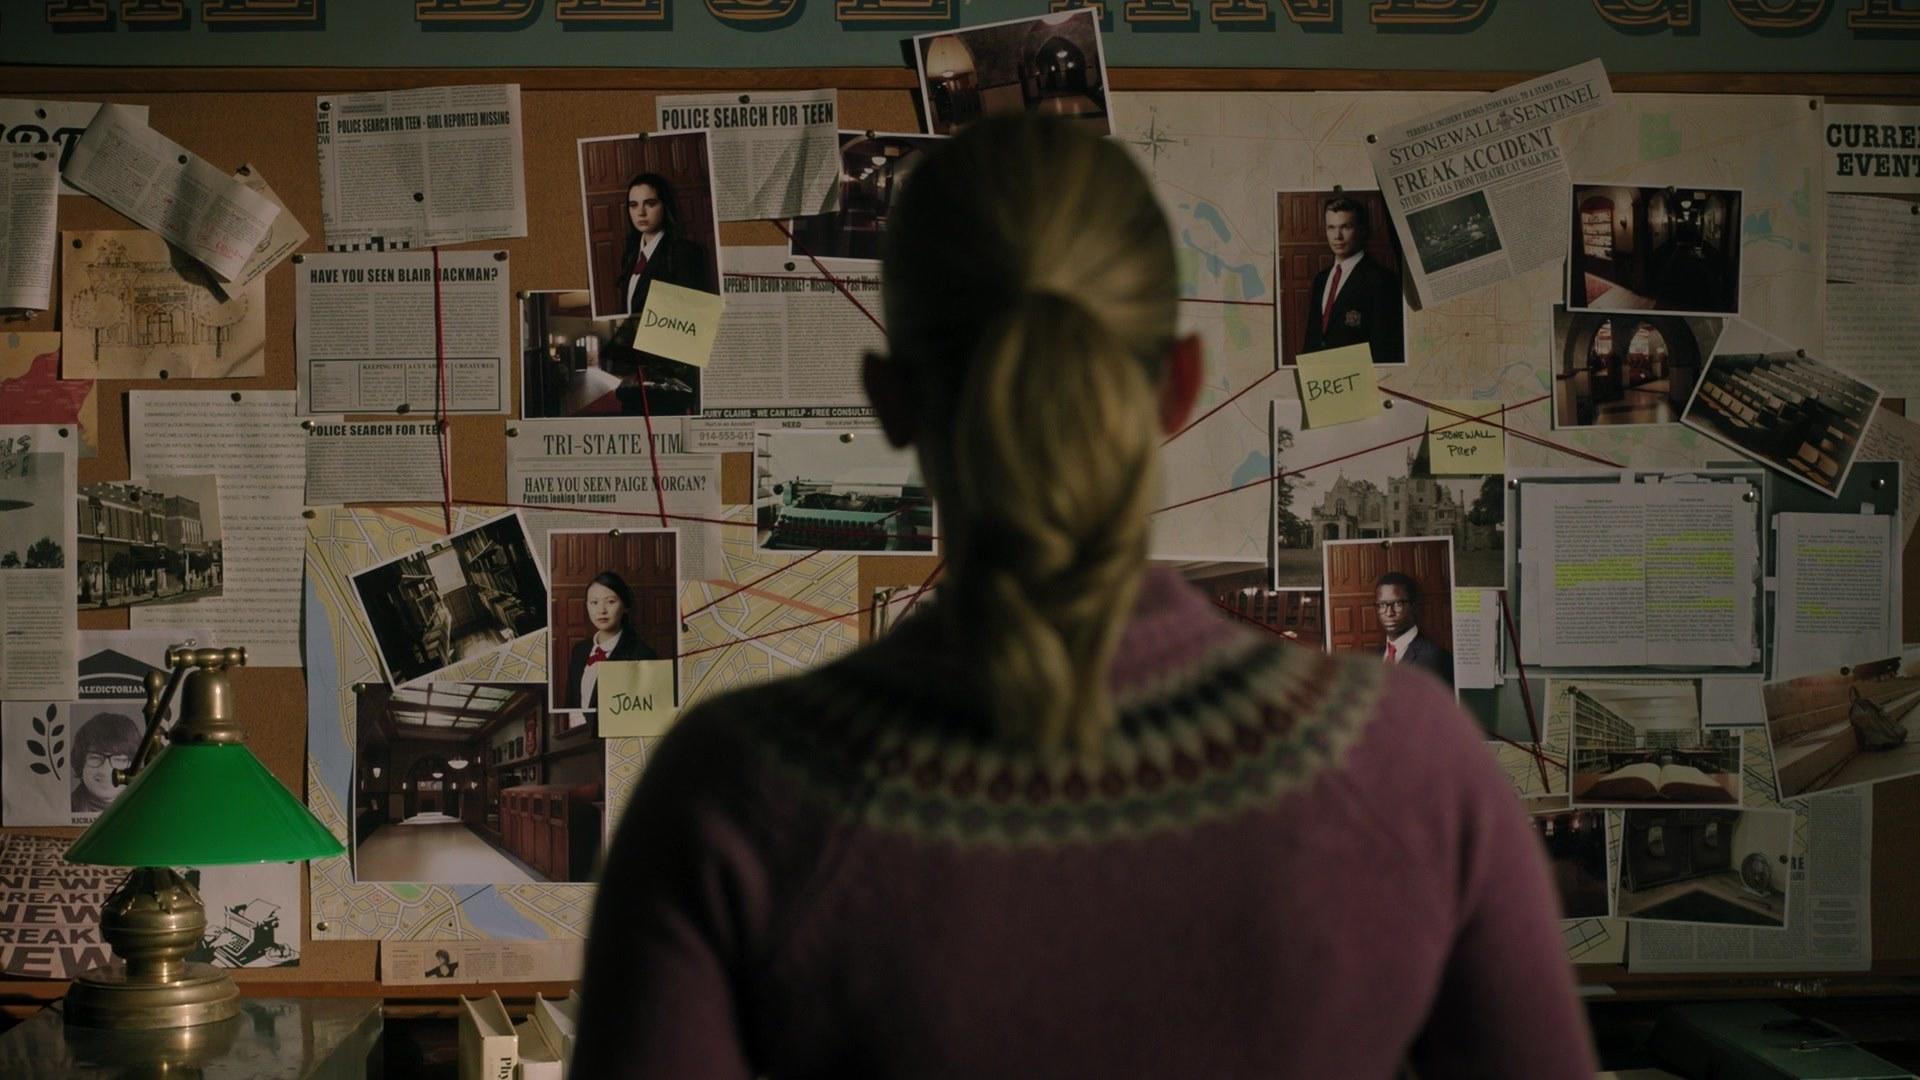 Betty admiring a murder investigation board